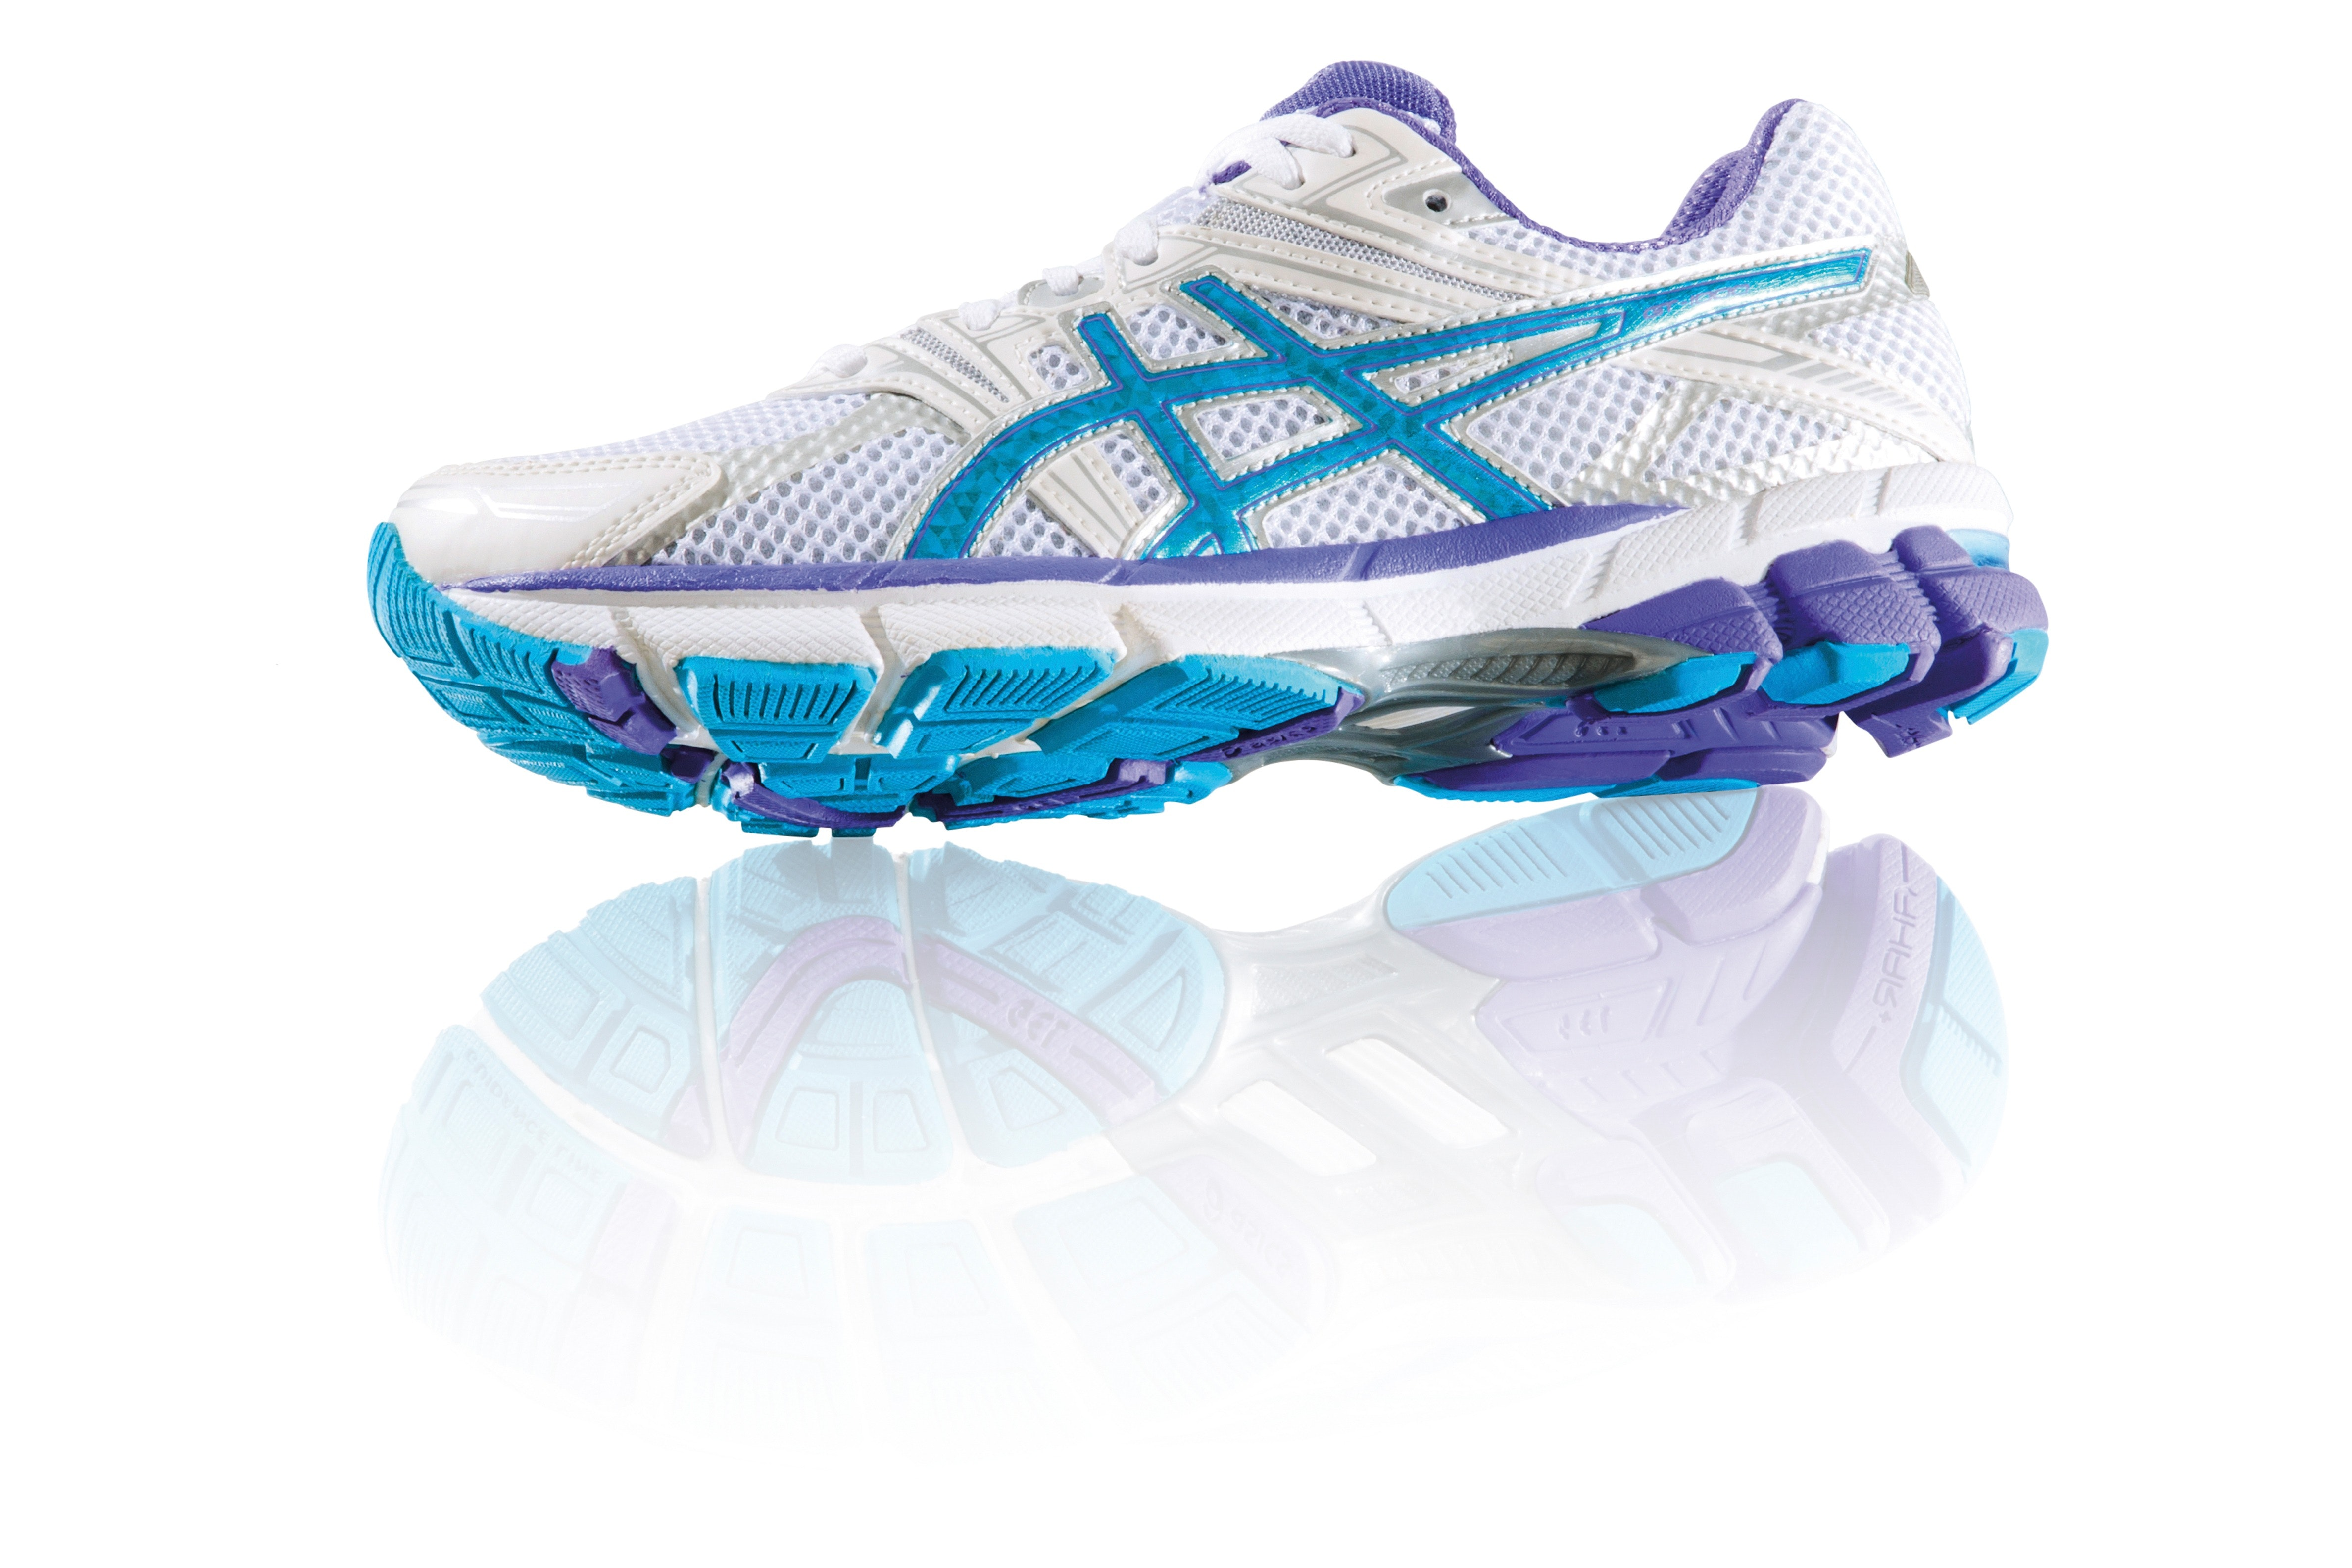 Vita jogging skor